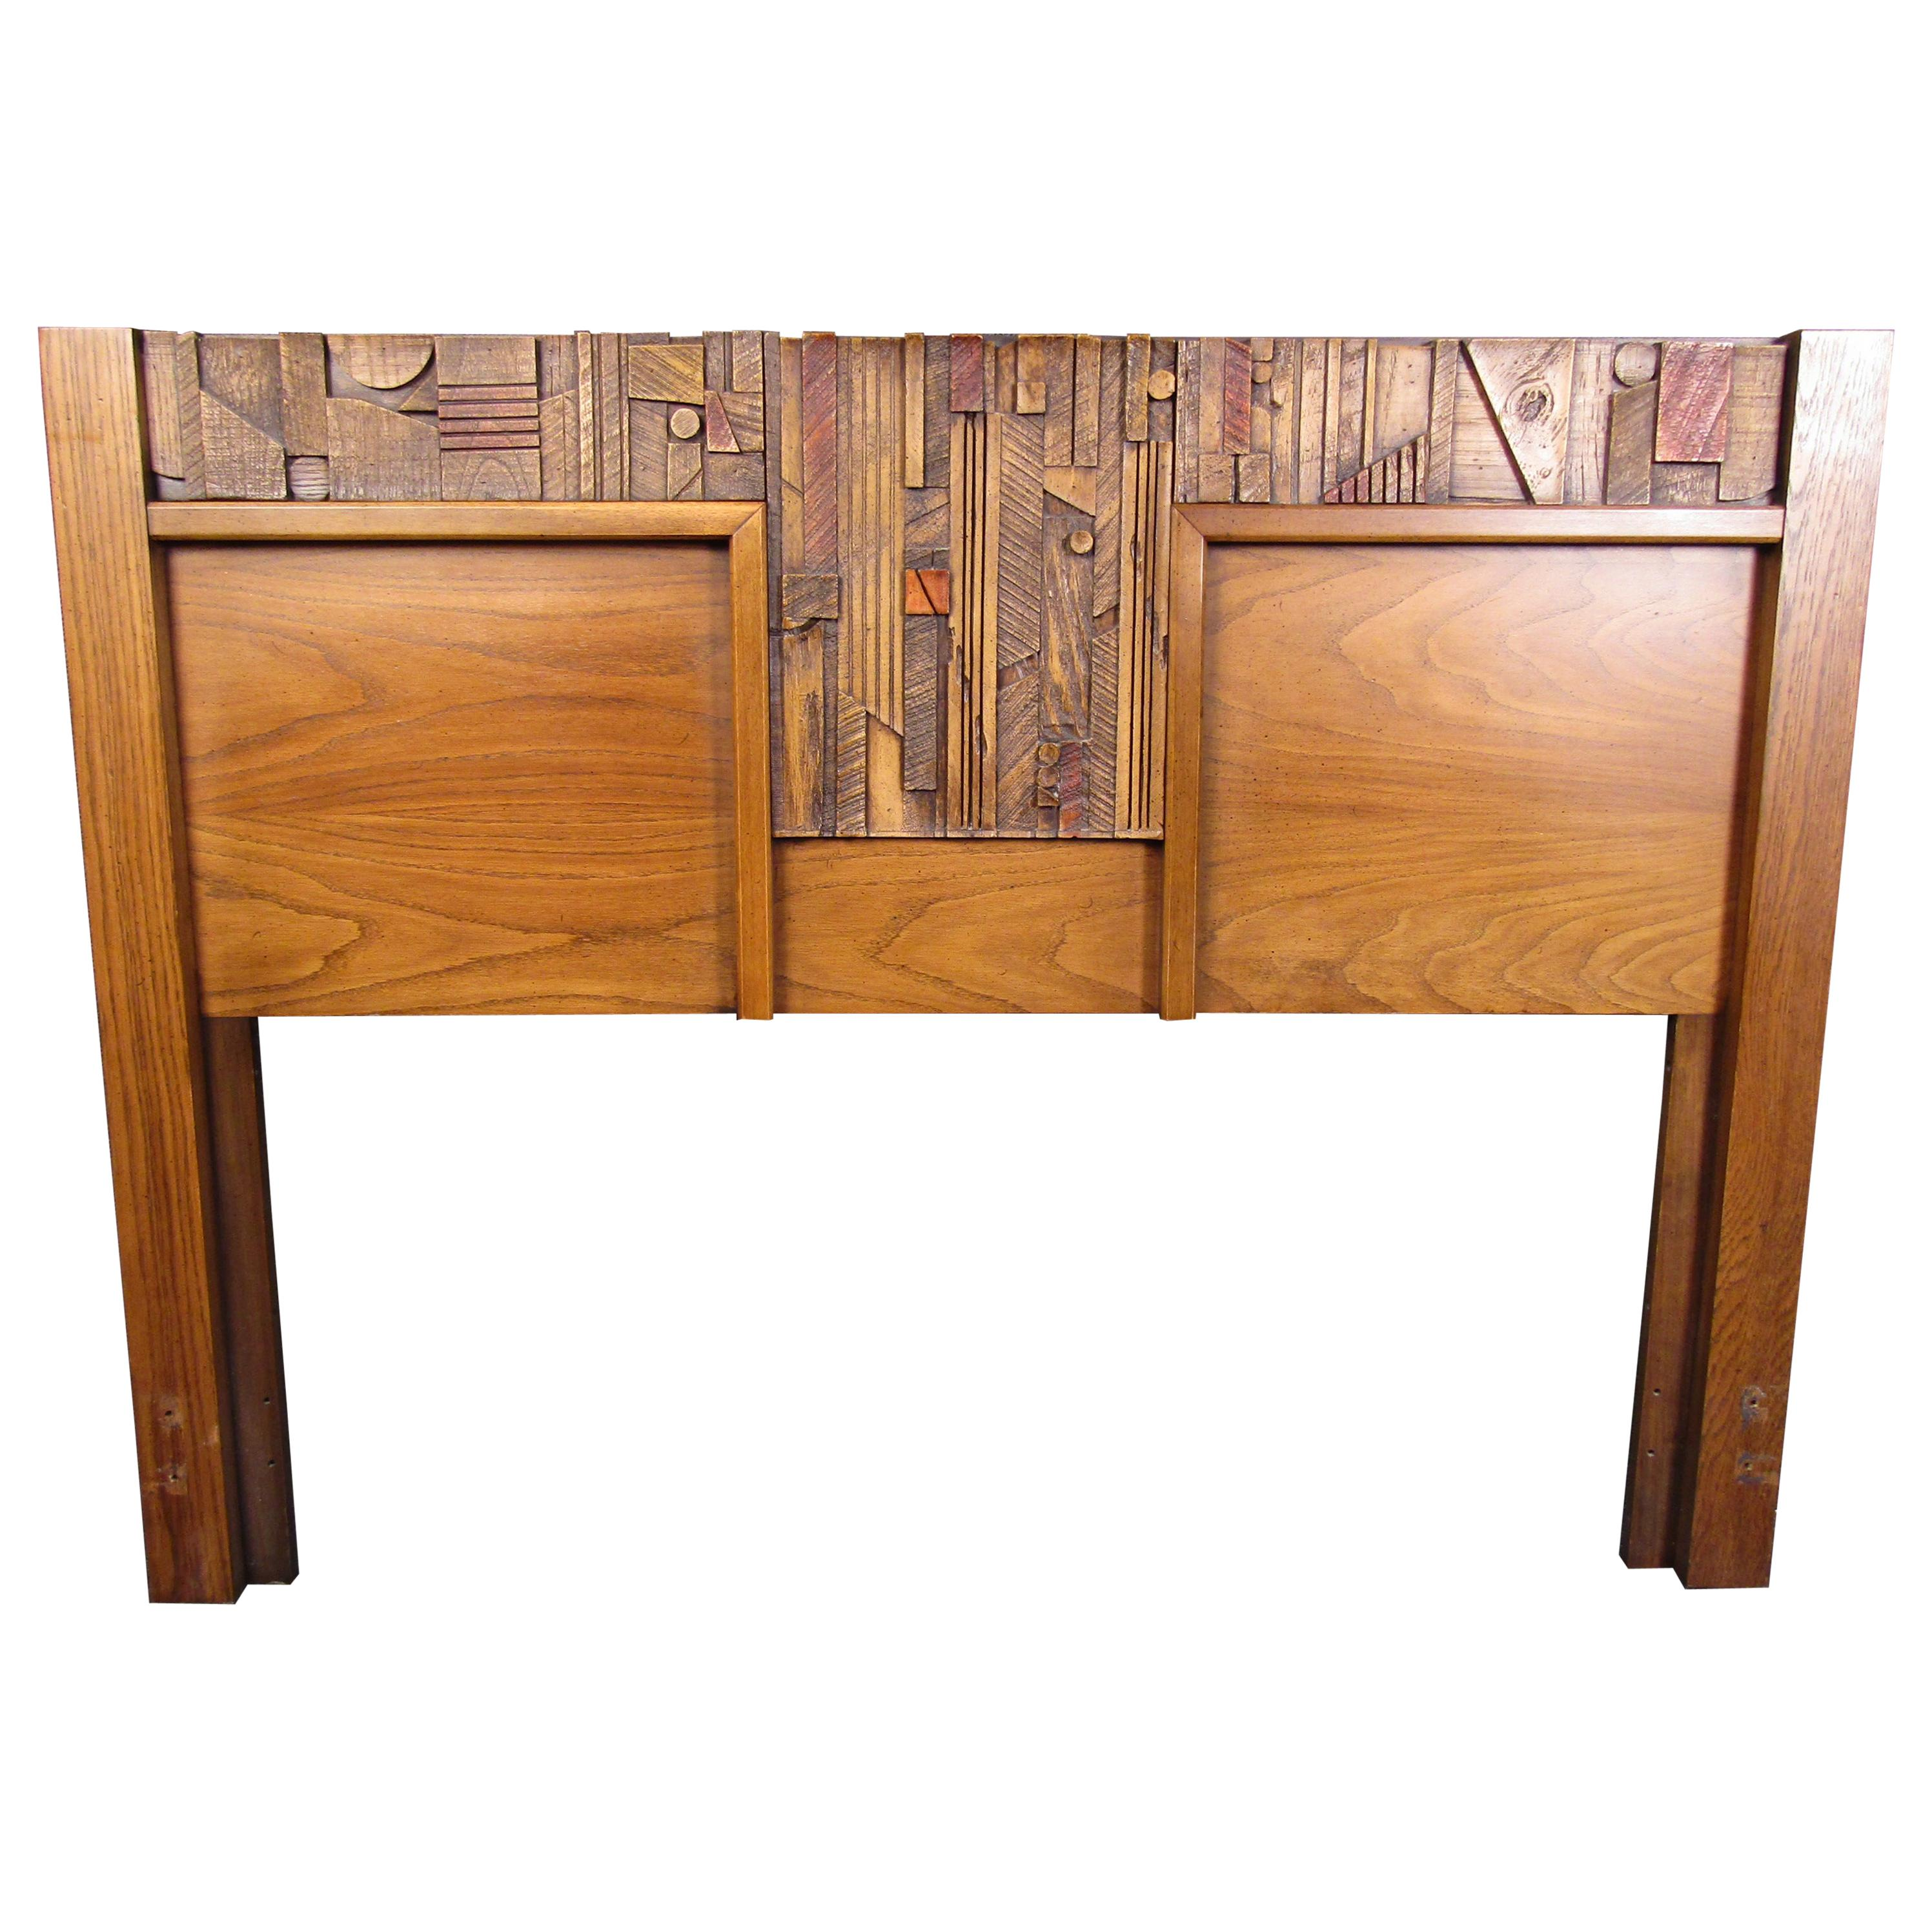 Vintage Brutalist Wooden Headboard by Lane Furniture